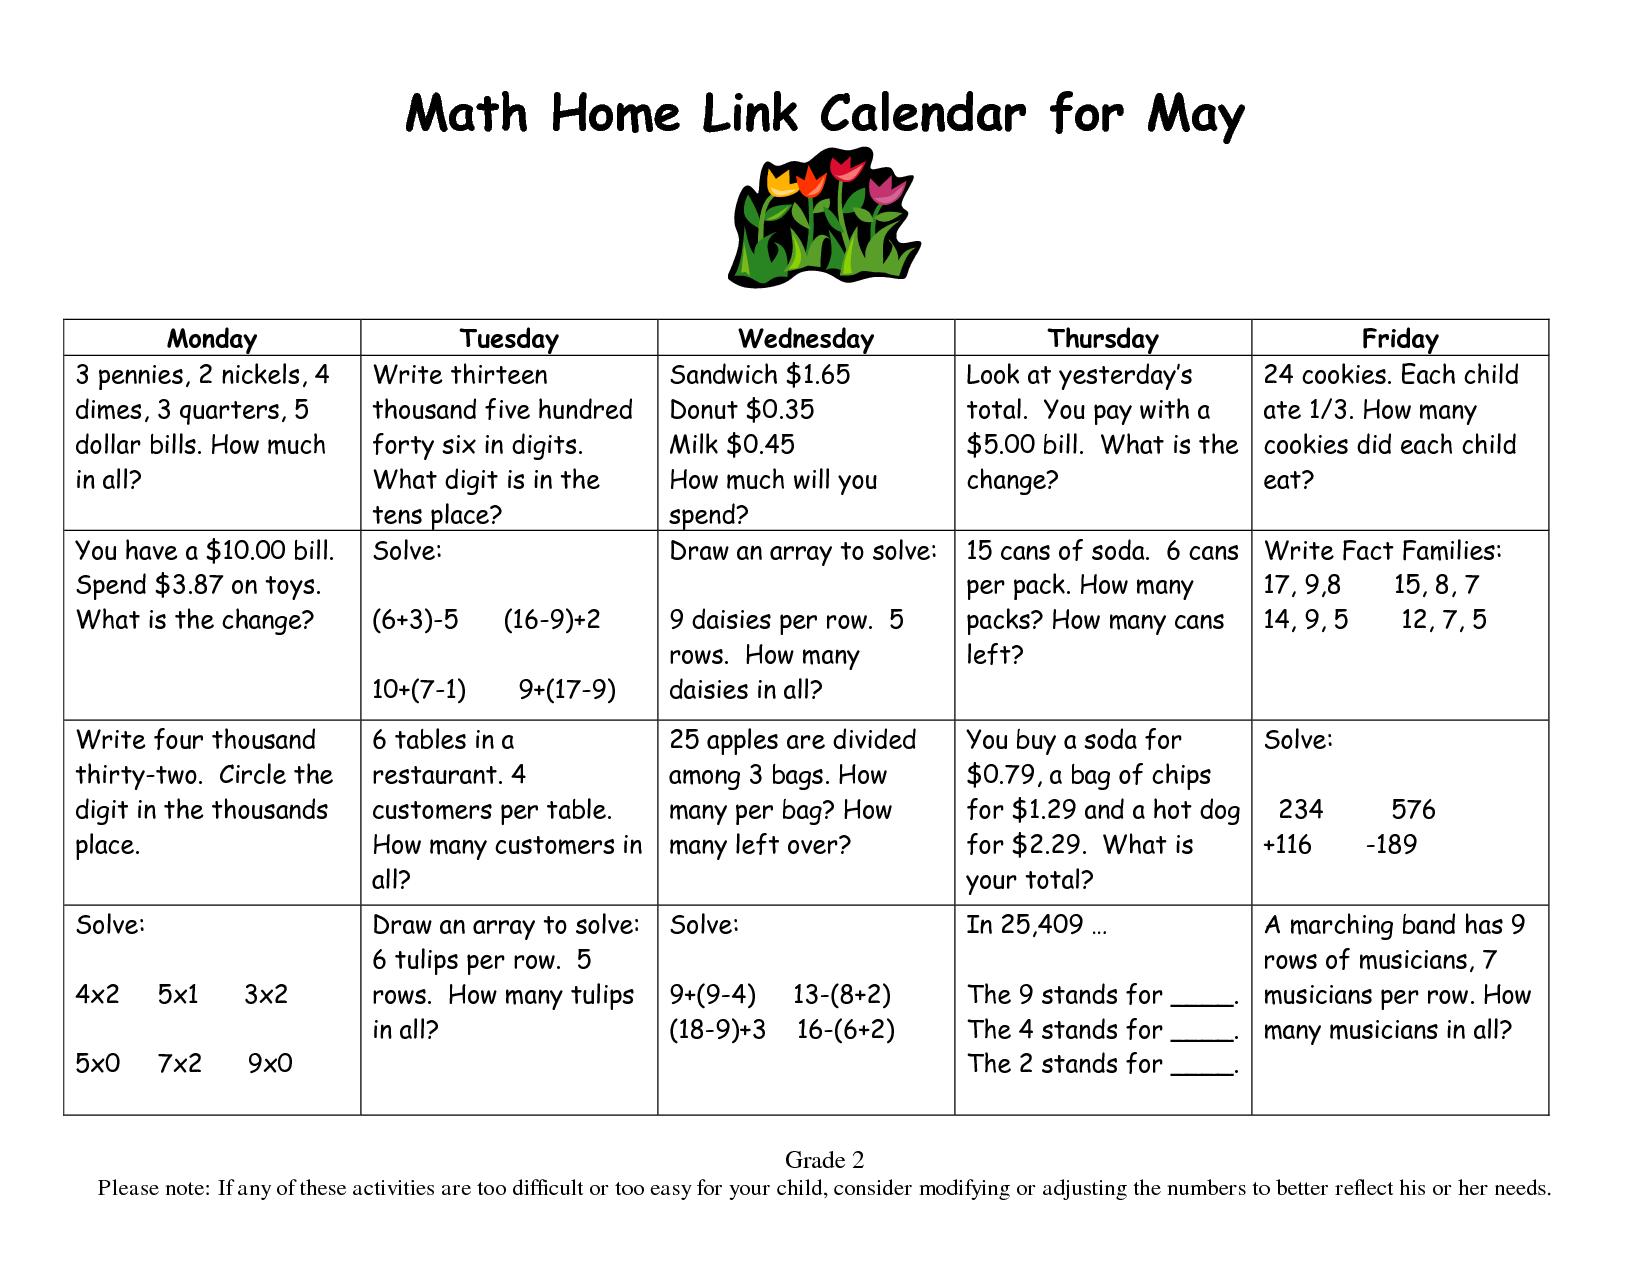 Worksheets Everyday Math Grade 2 Worksheets calendar math for third grade 2 everyday home link may